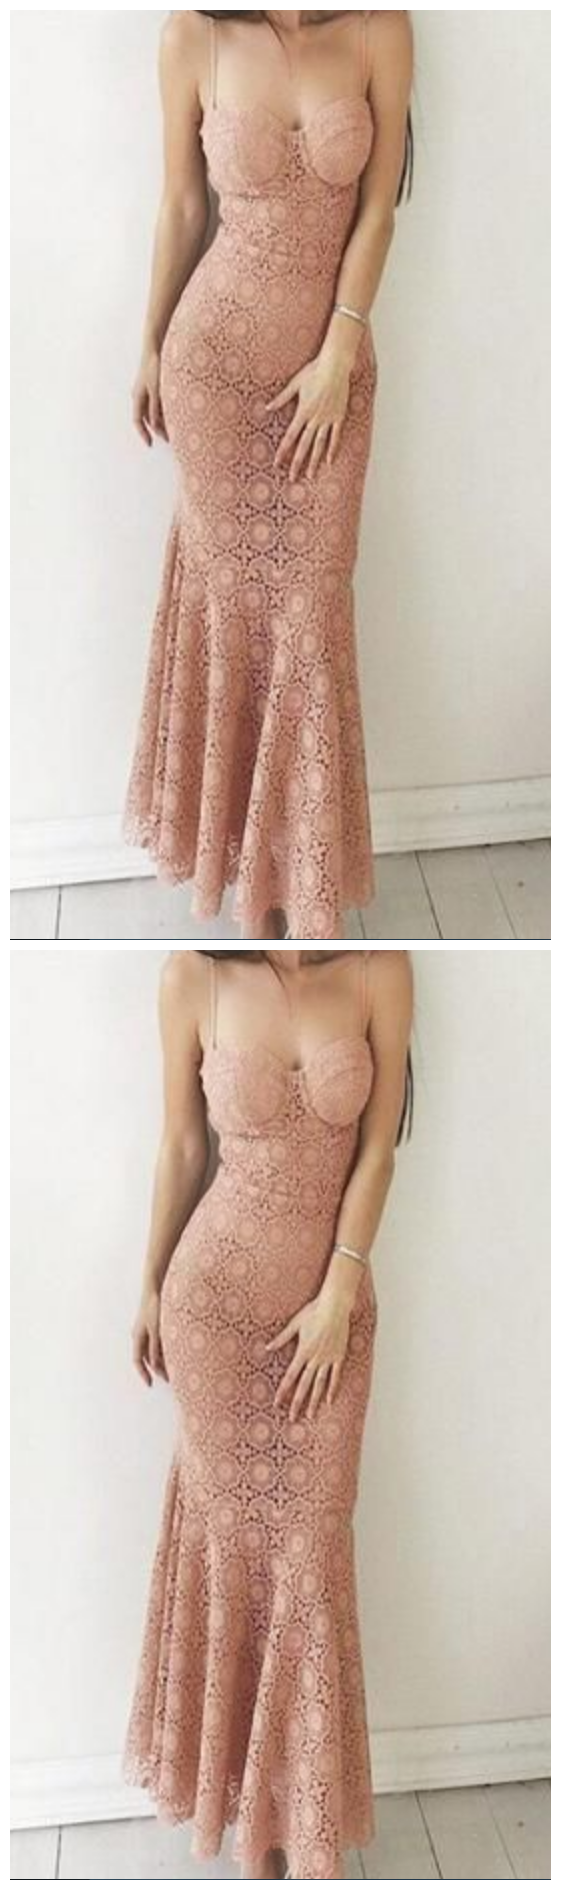 Elegant High Quliaty Charming Mermaid Spaghetti Straps Pink Lace Long Prom Party Dresses